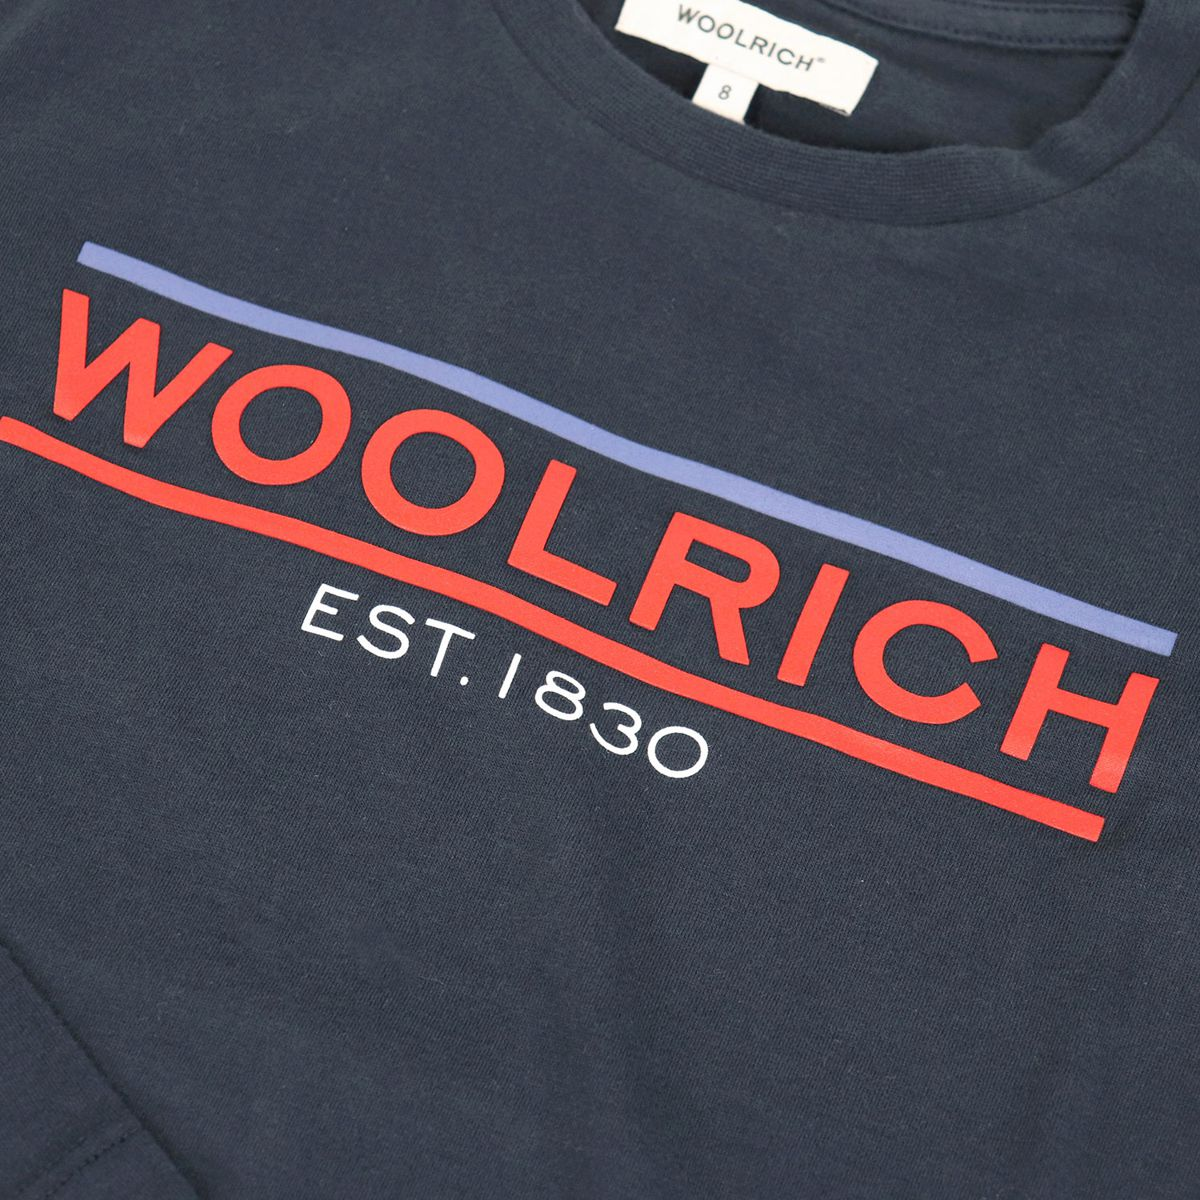 Long sleeve t-shirt with logo Blue Woolrich